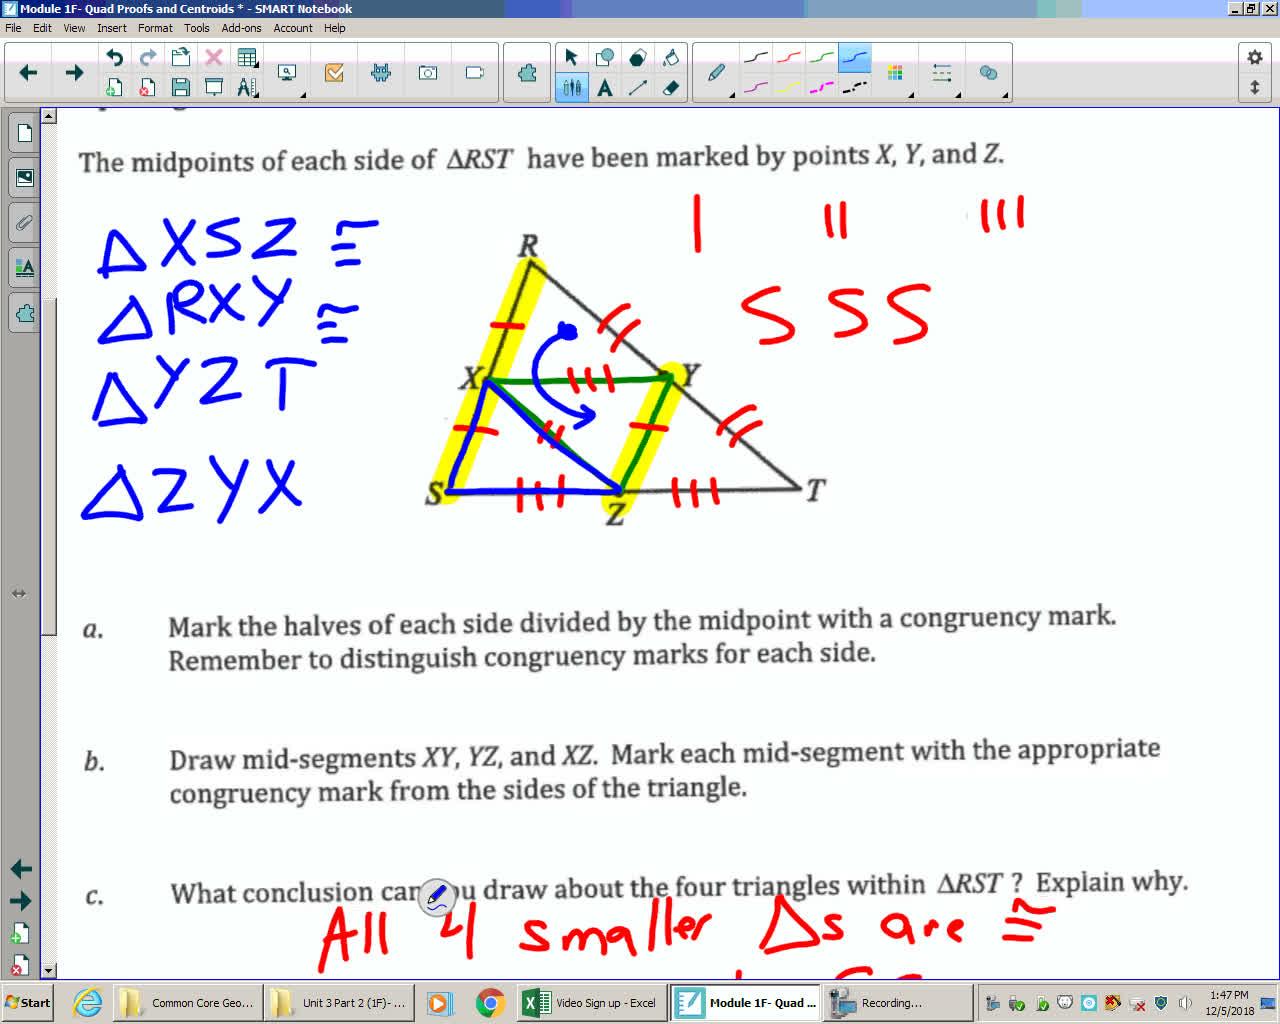 Mod 1F Unit 3B Lesson 5